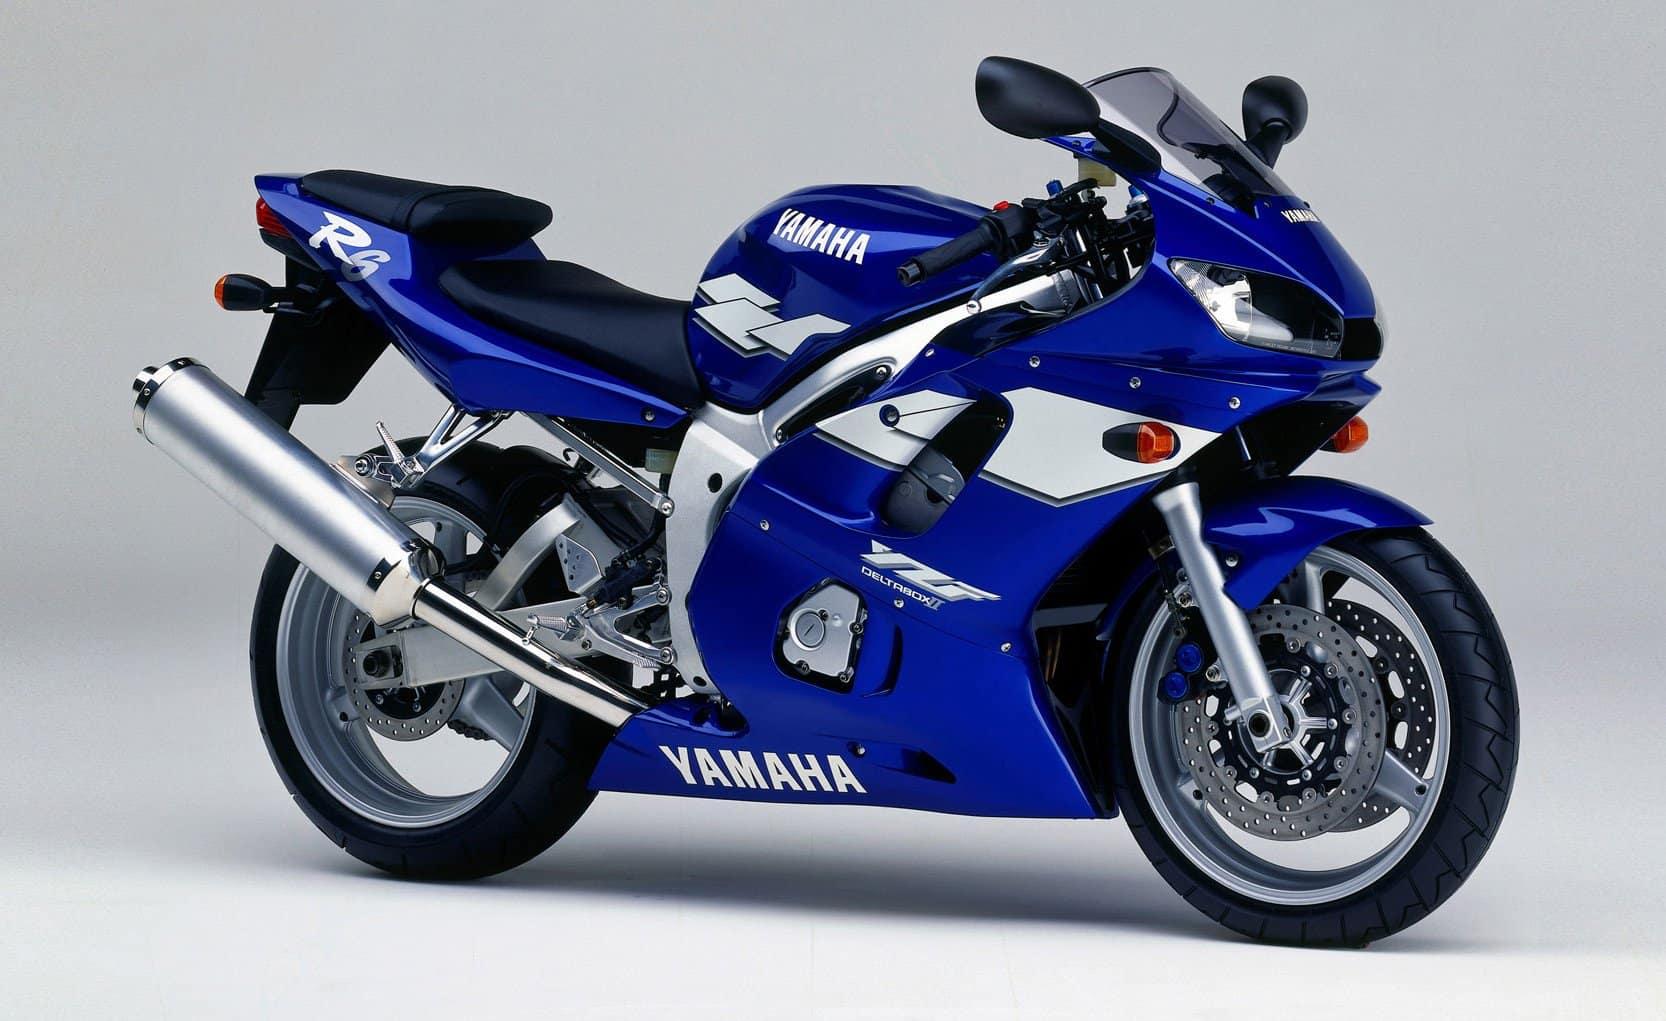 Original, first generation Yamaha R6 in blue